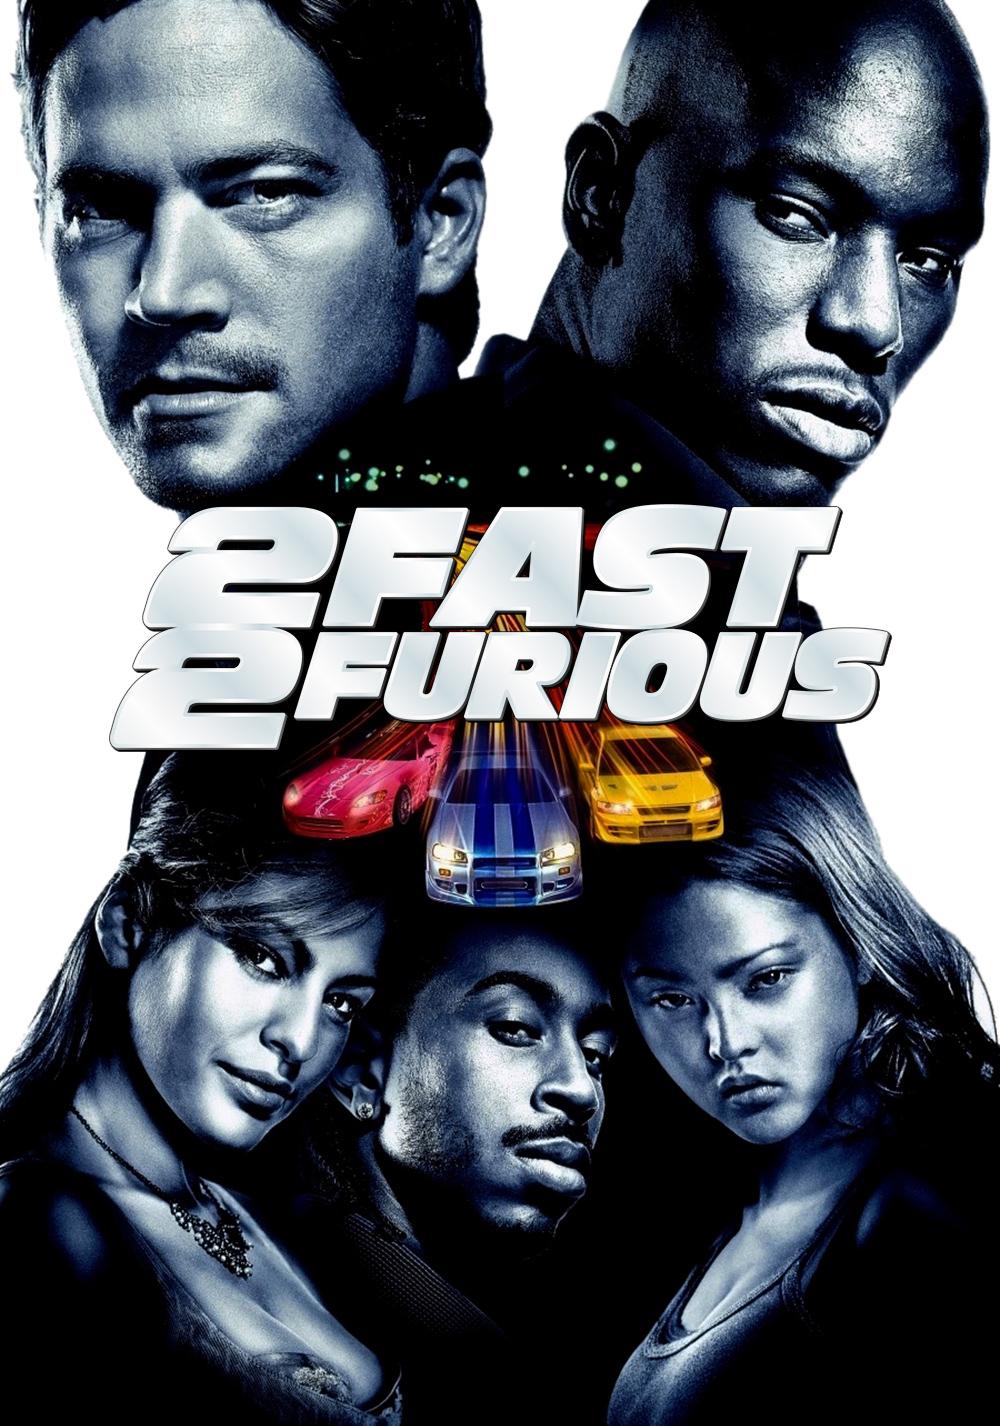 2 fast 2 furious movie fanart. Black Bedroom Furniture Sets. Home Design Ideas